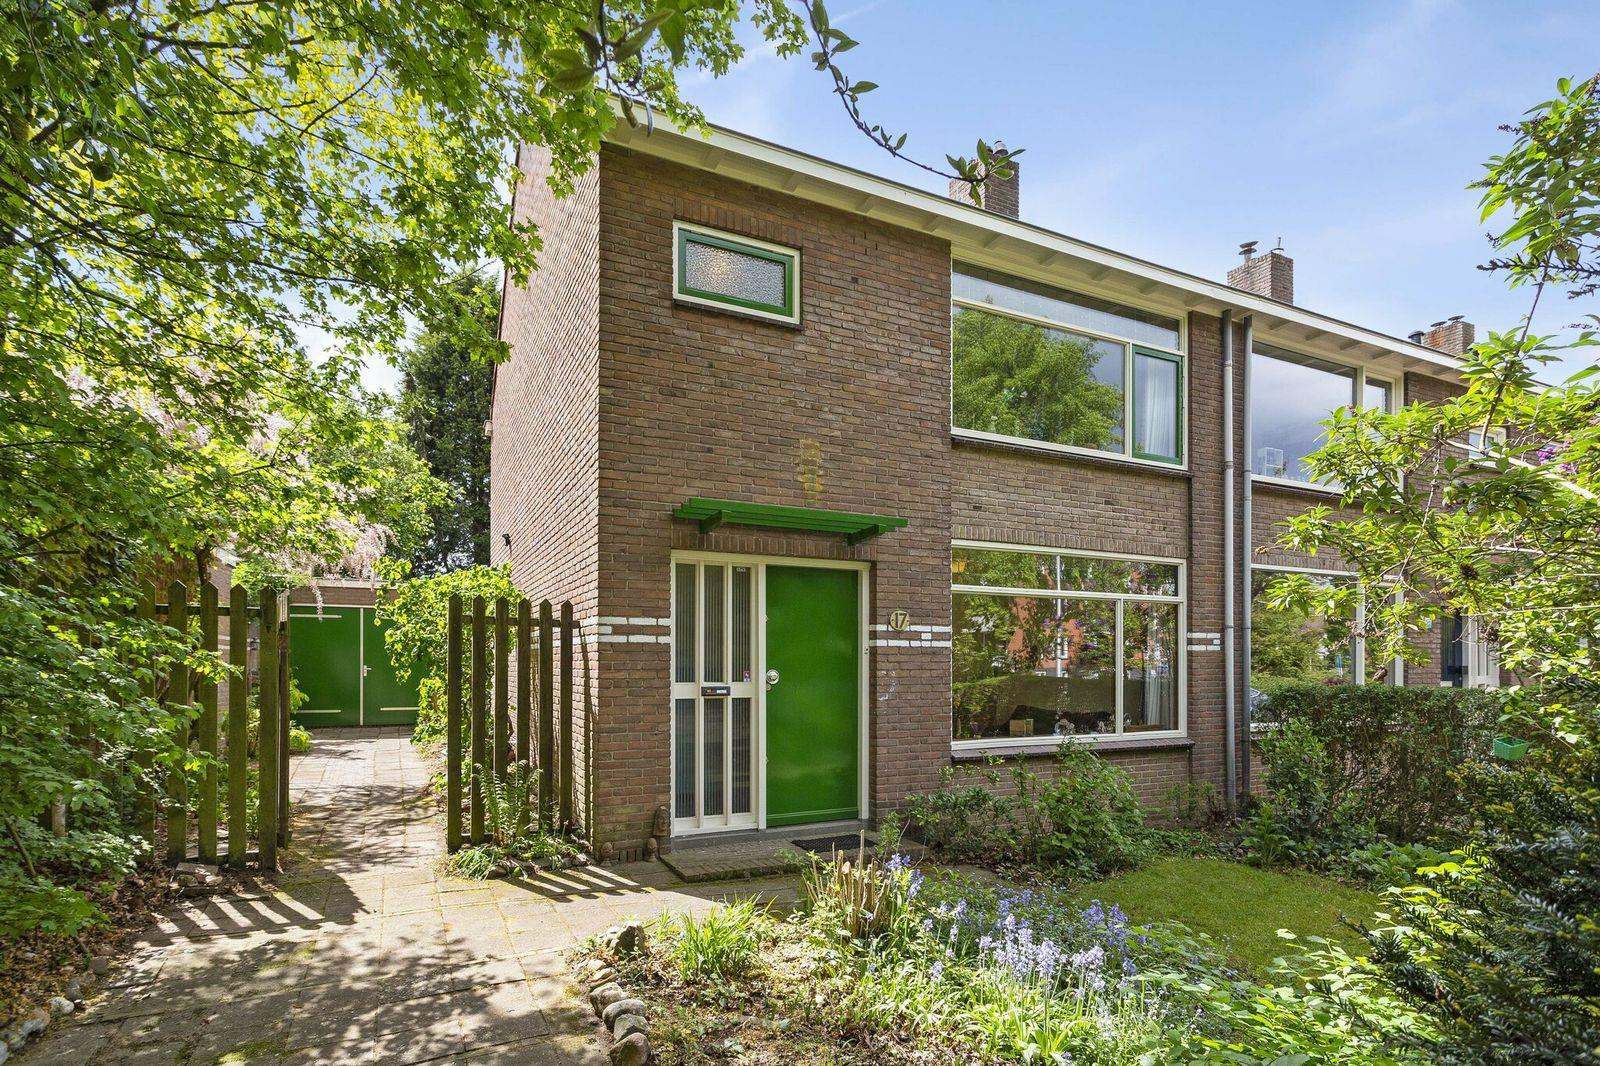 Einsteinstraat 17, Nijmegen